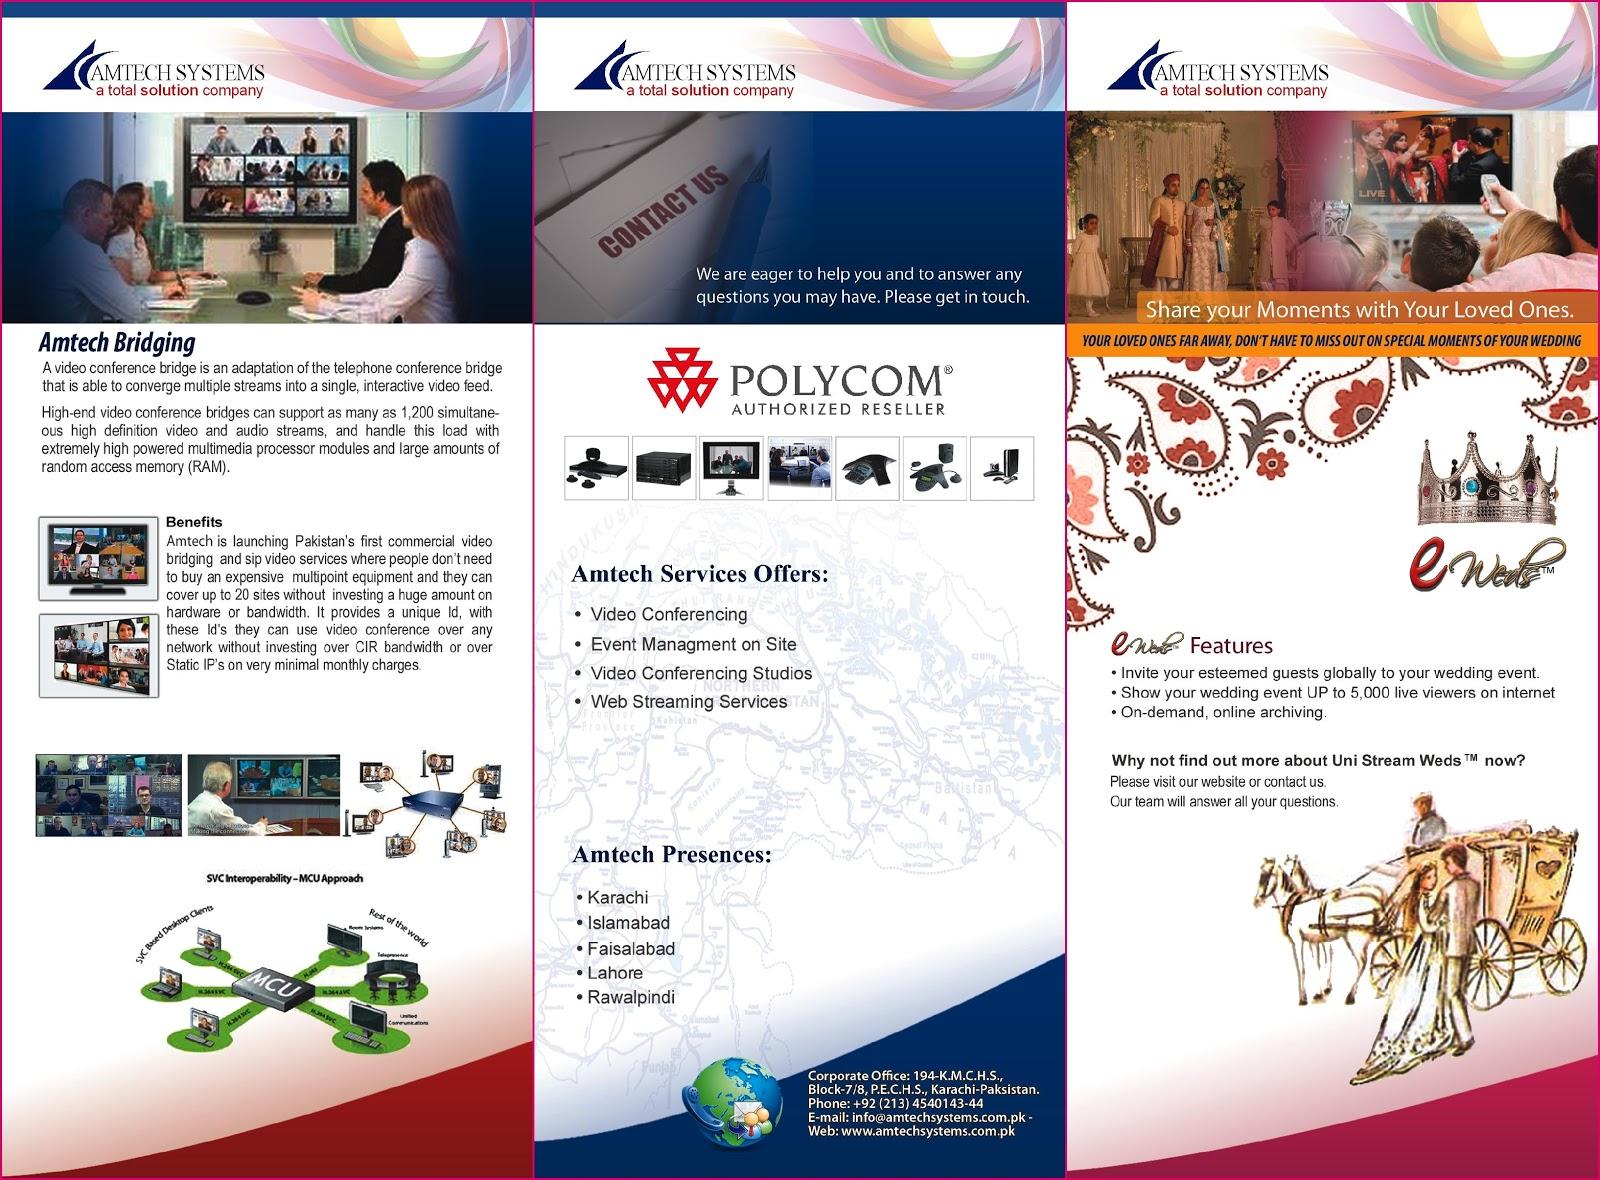 Pakistan Premier Current Affairs & Technology Affairs: March 2012